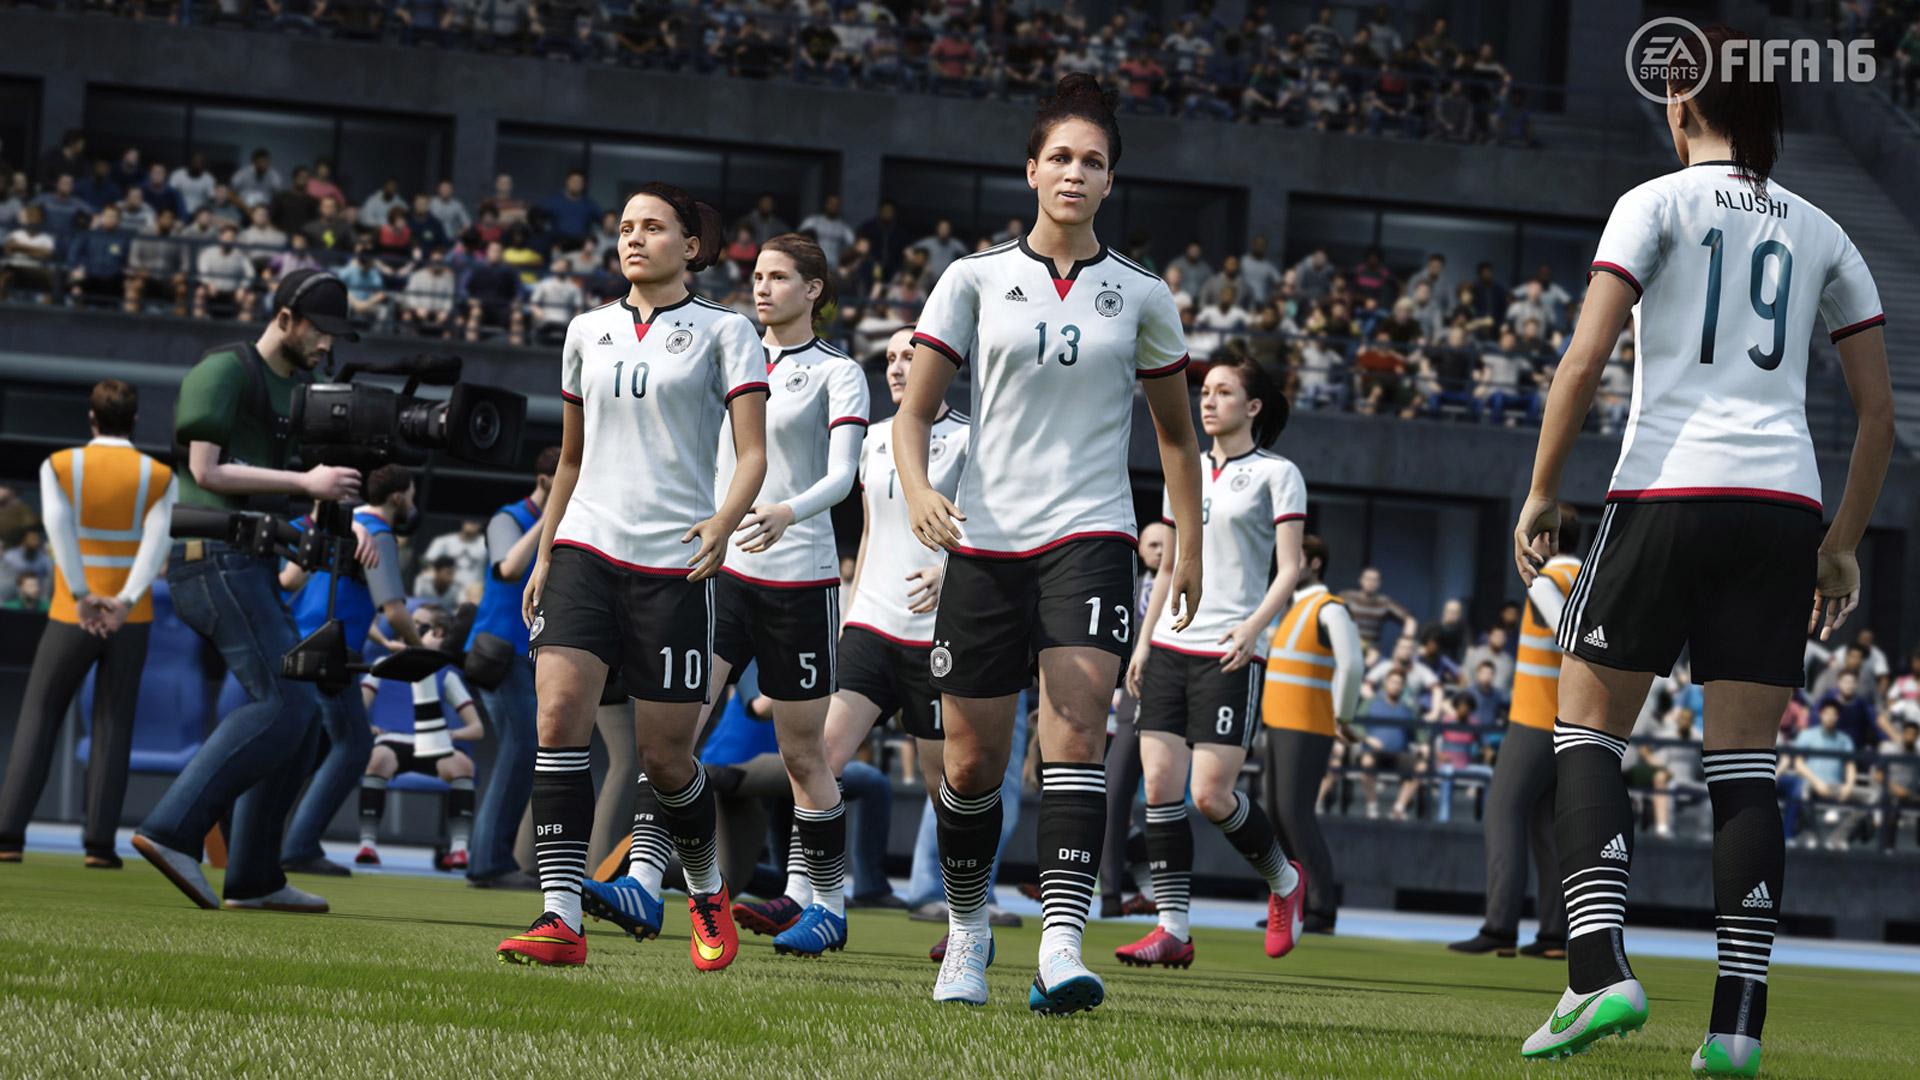 FIFA 16 wallpaper 3